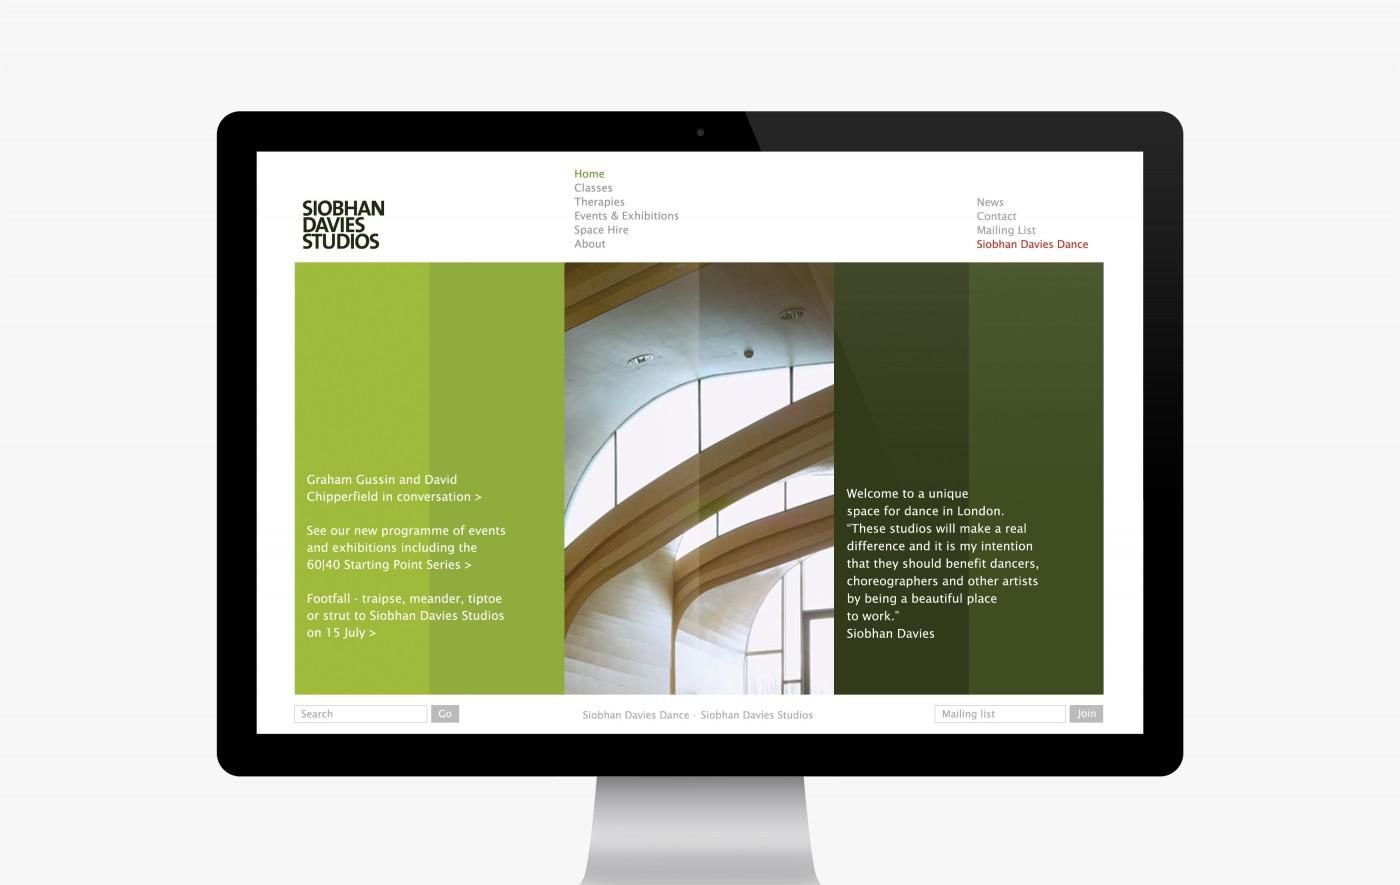 Siobhan Davies Studios website (2007-2013)